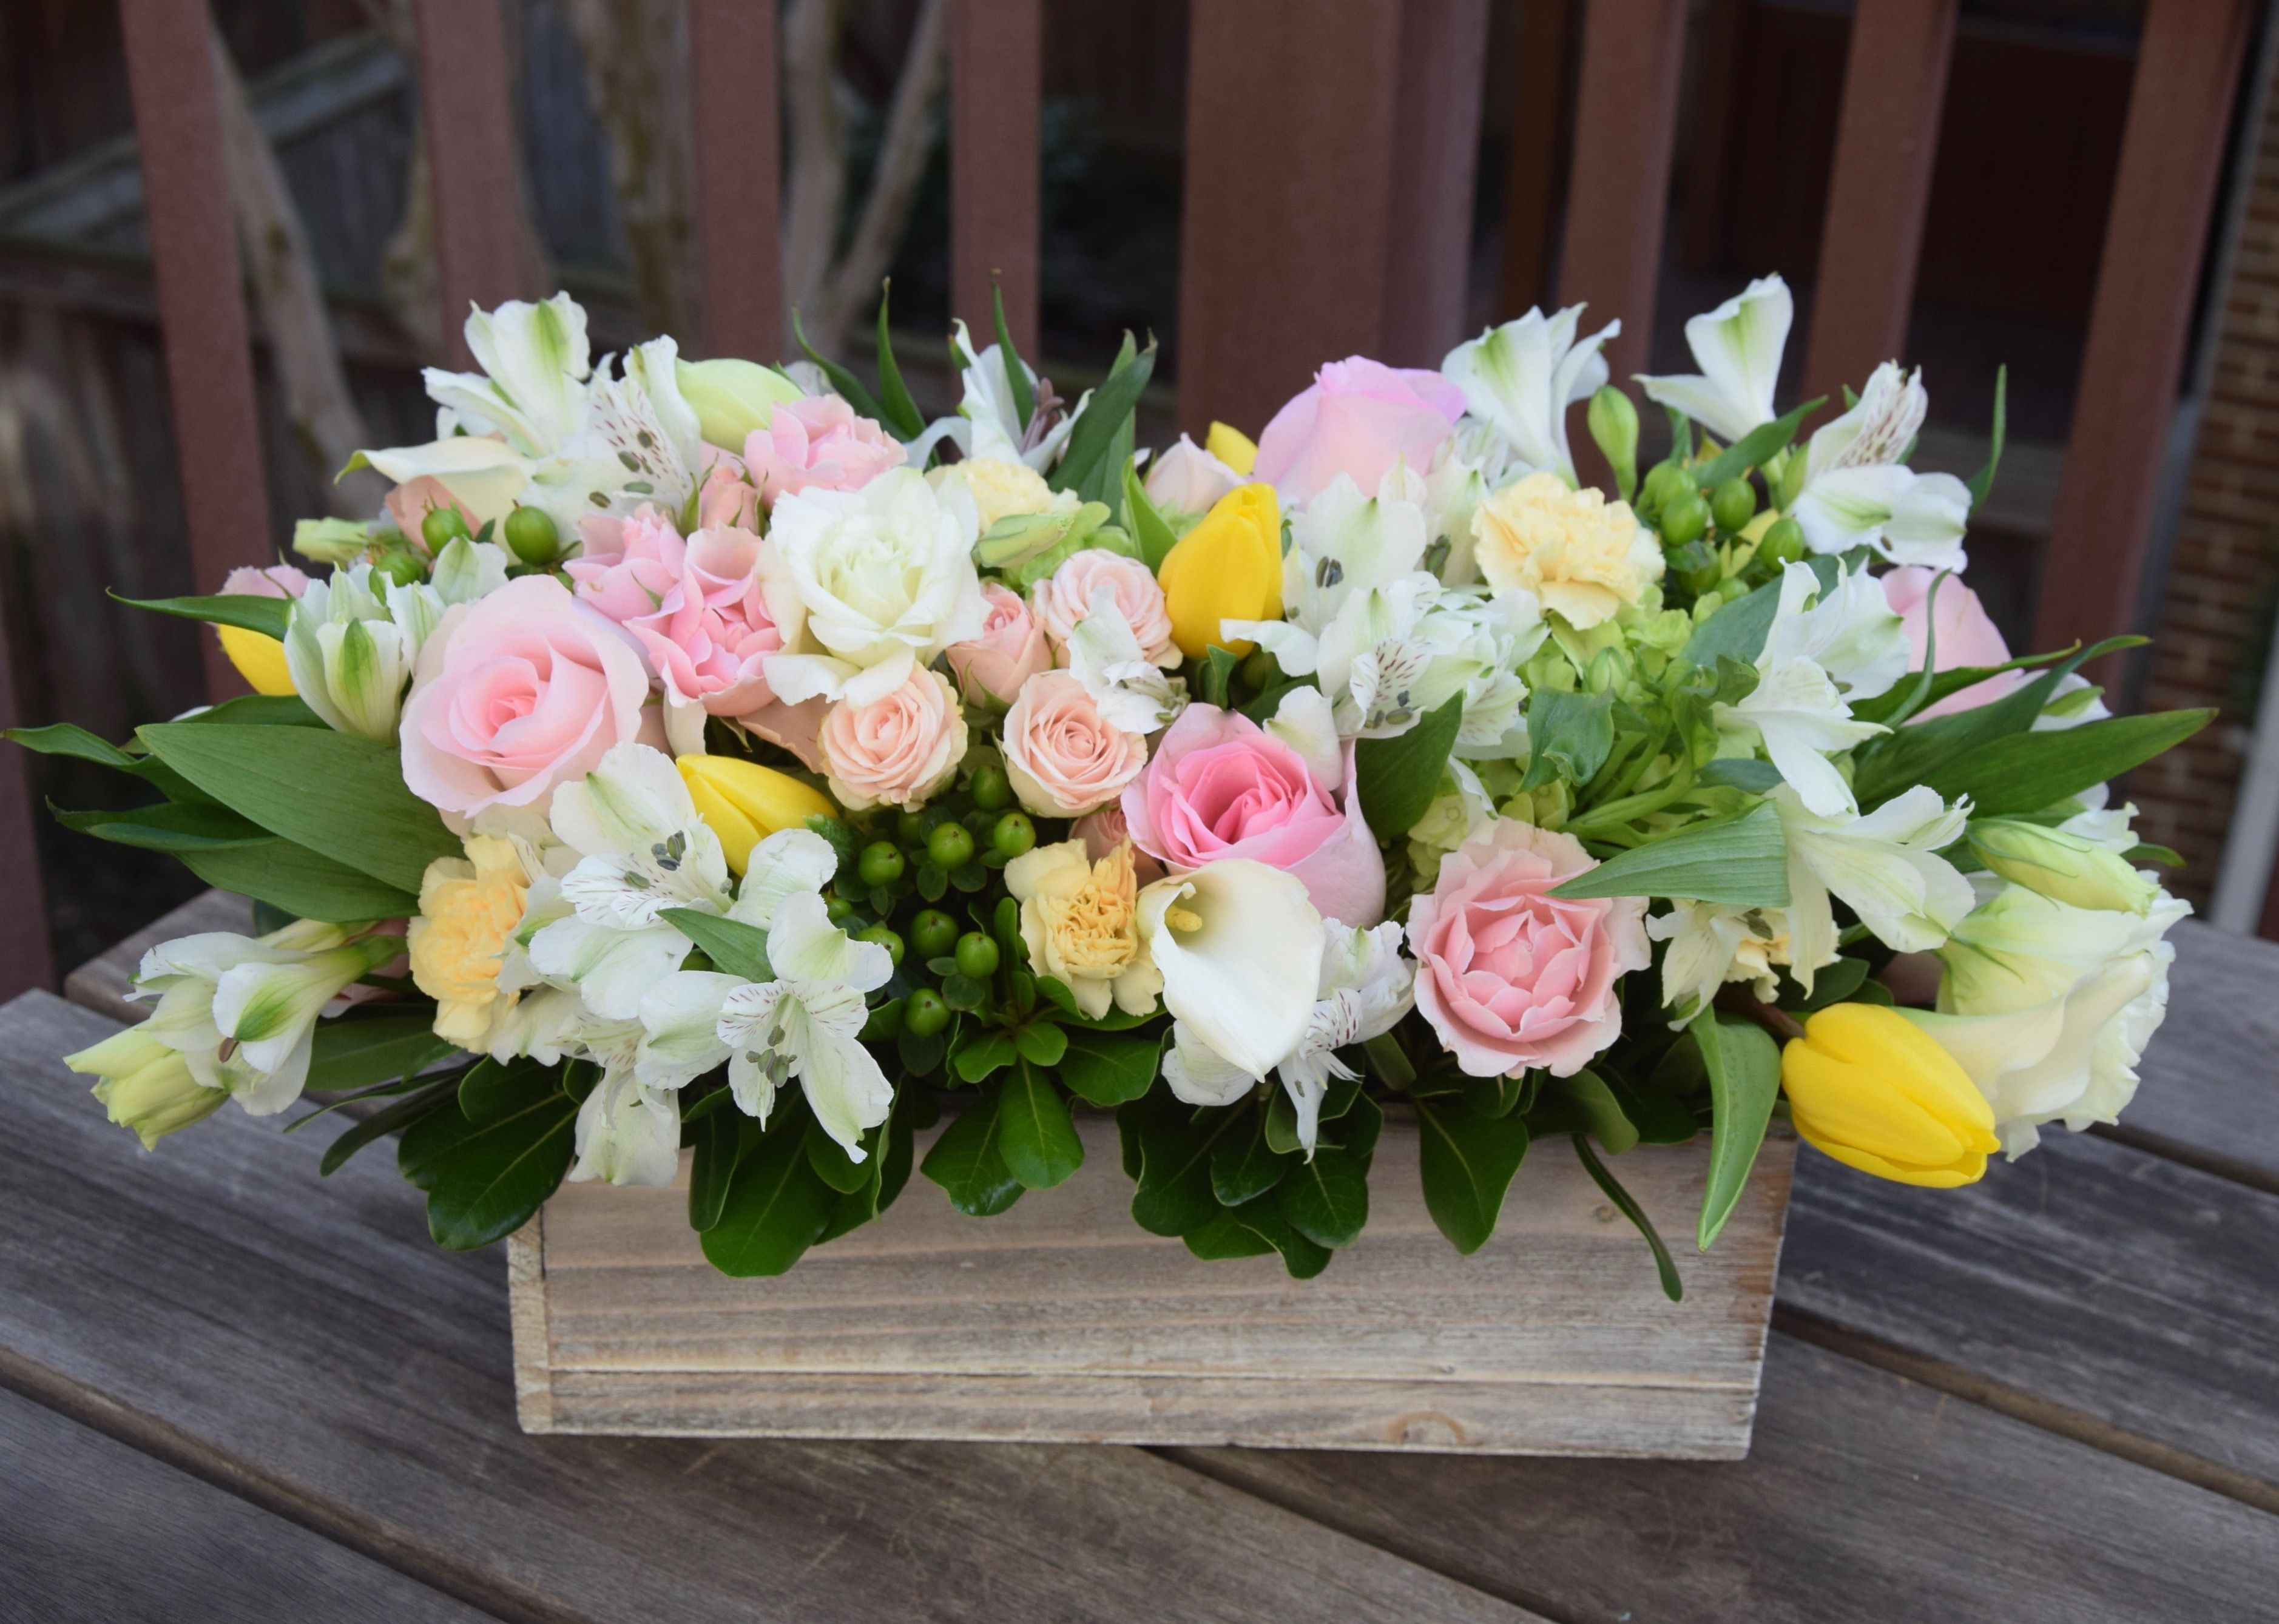 Floral Gift Box For A Blooming Garden Flower Arrangements